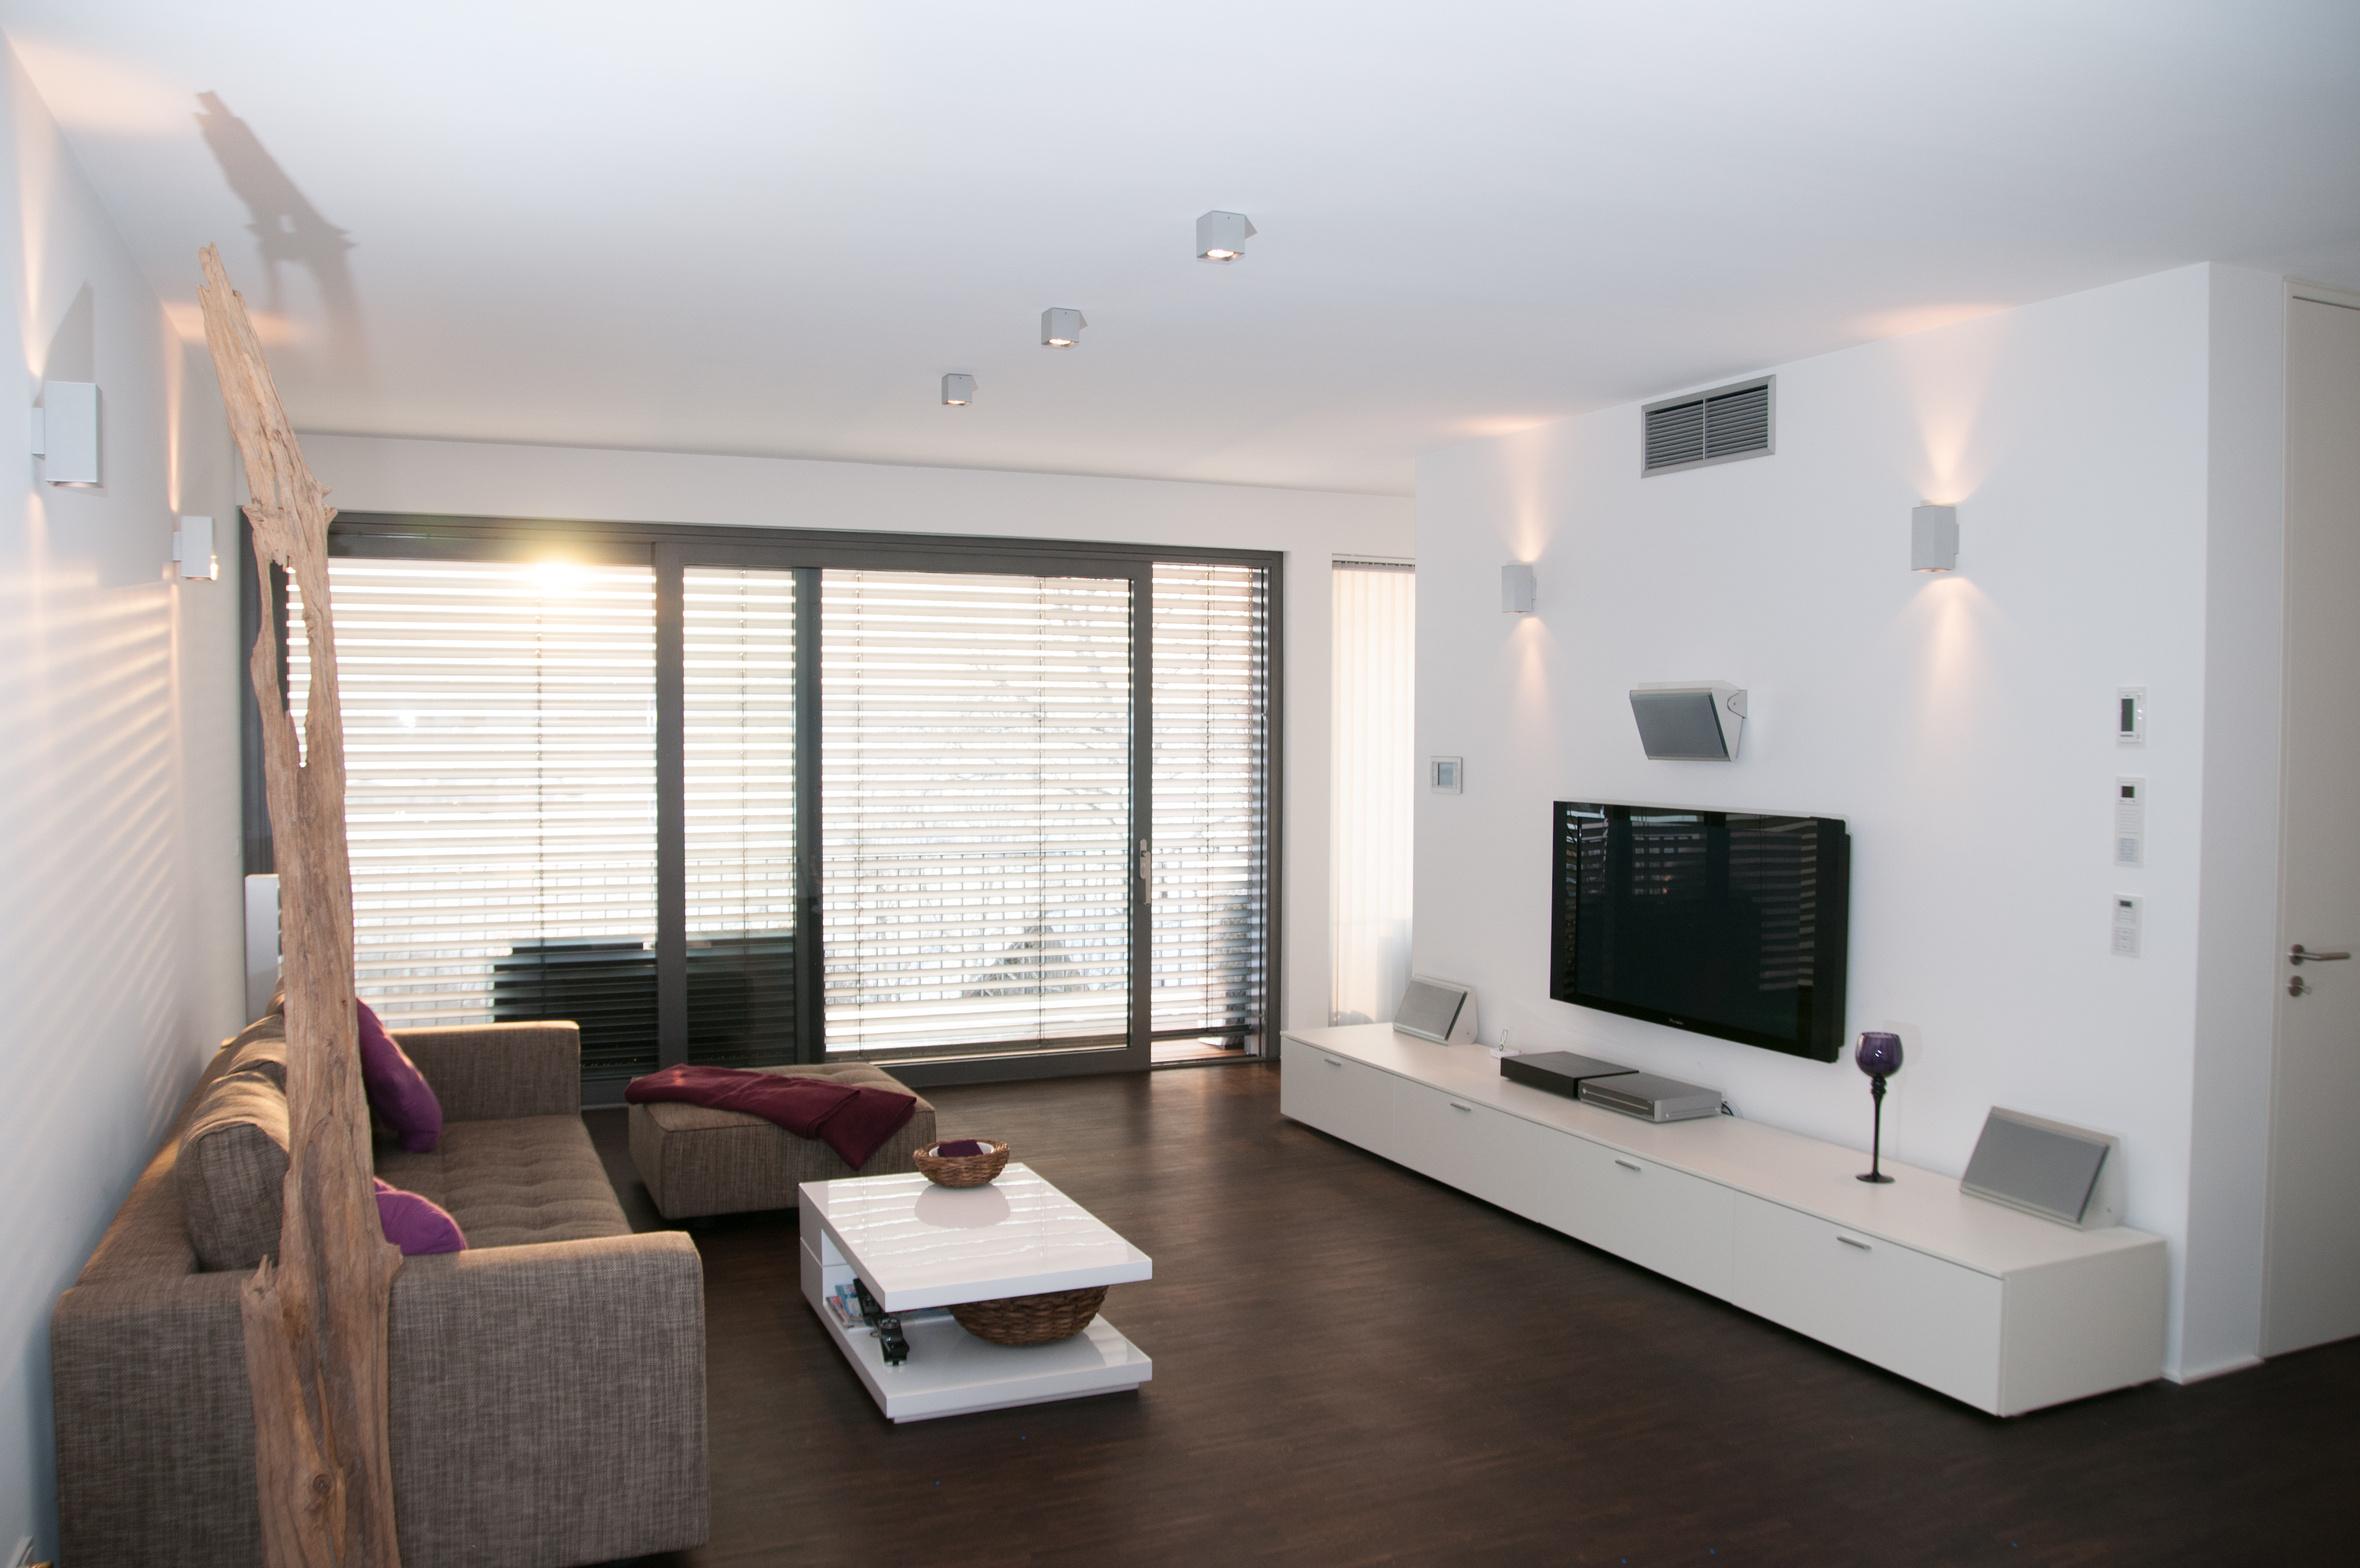 trittschalld mmung silence floor akustik f r fu bodenheizung 50 gehschal ebay. Black Bedroom Furniture Sets. Home Design Ideas